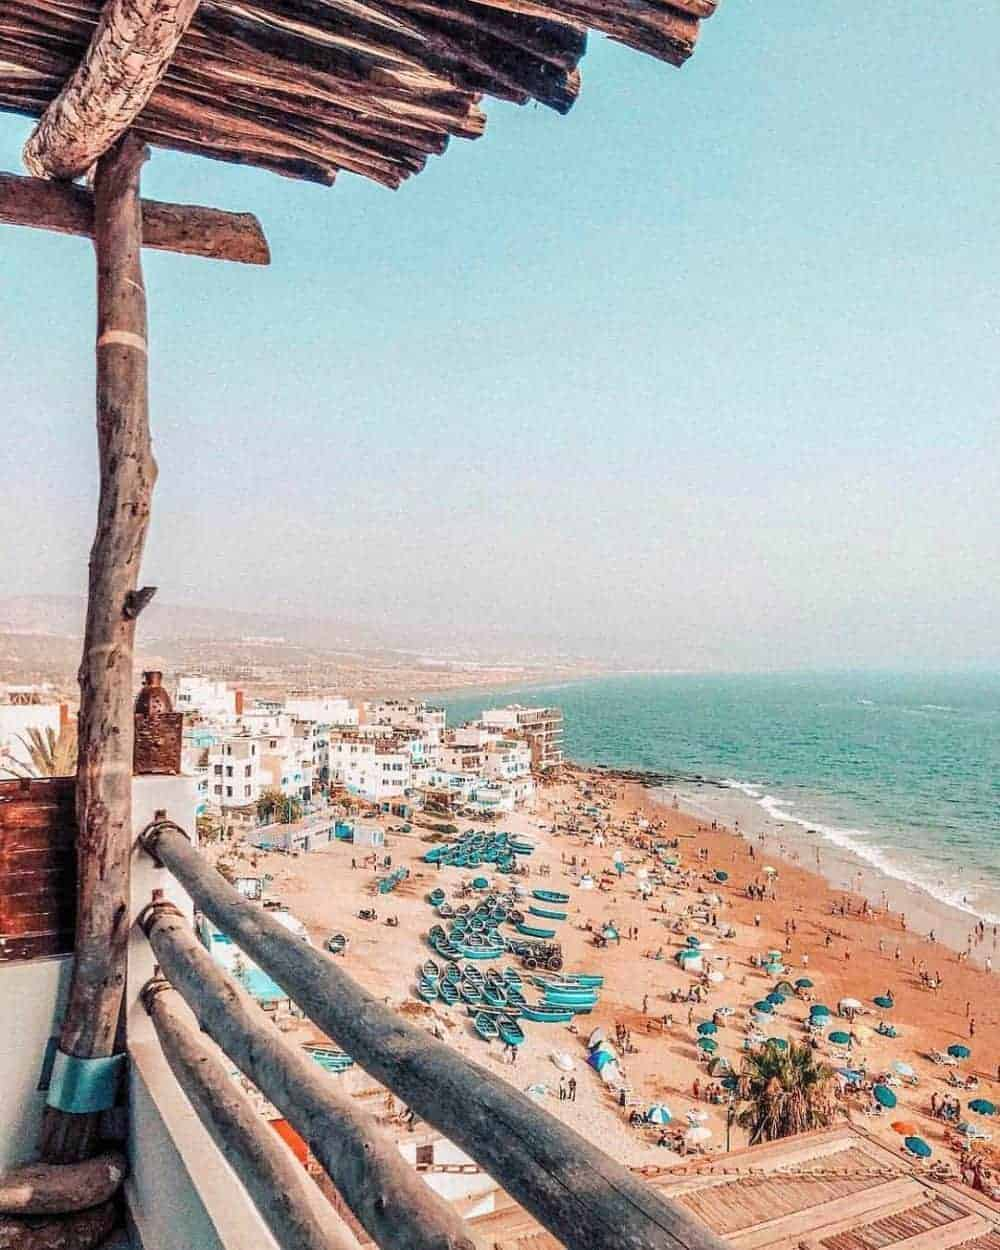 Morocco coasts at Agadir